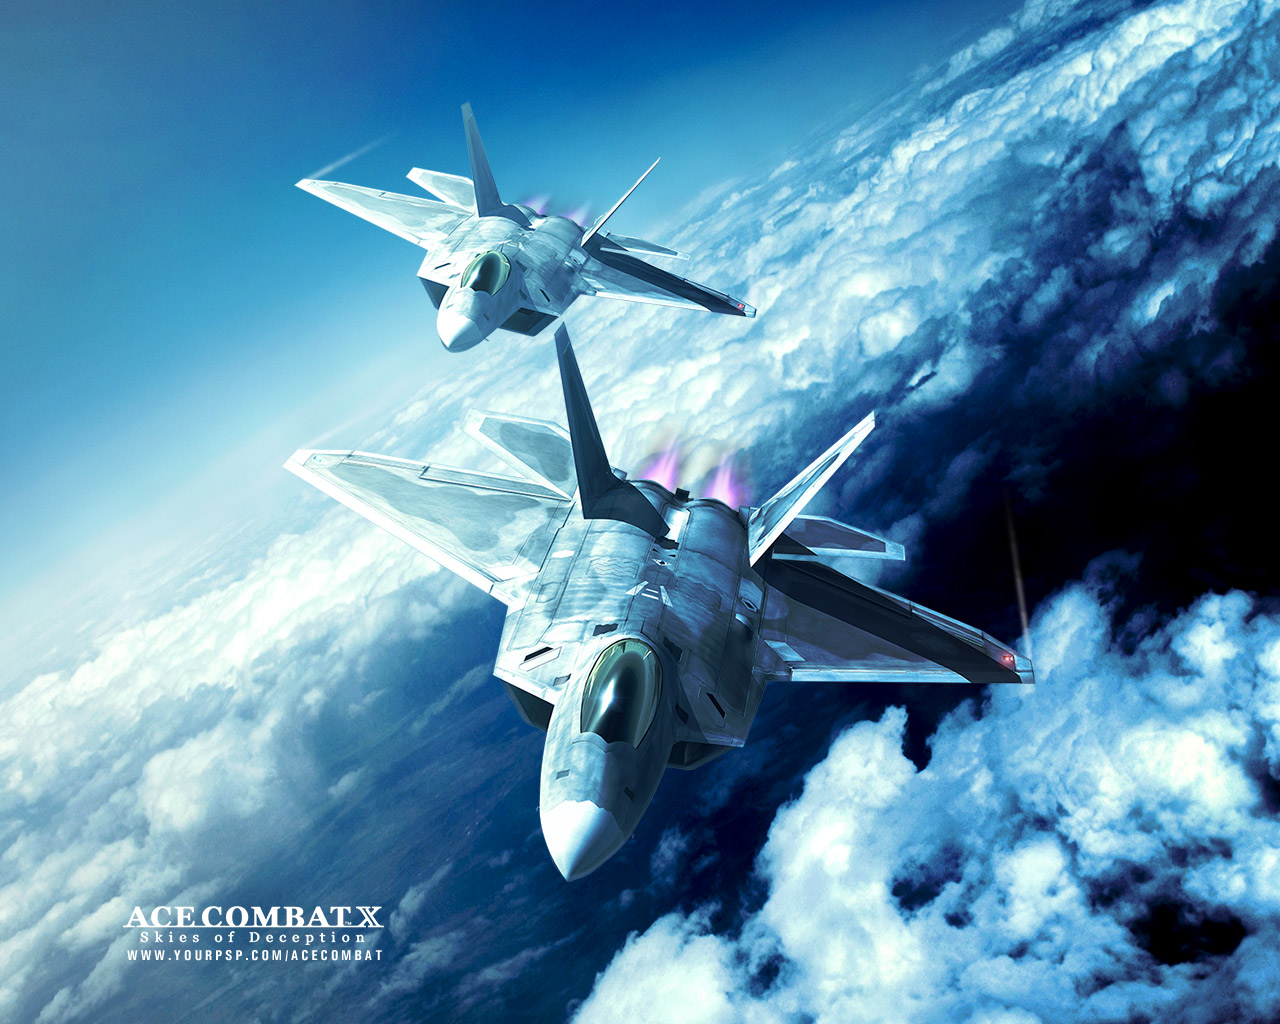 Video Game   Ace Combat Ace Combat 3 Wallpaper 1280x1024